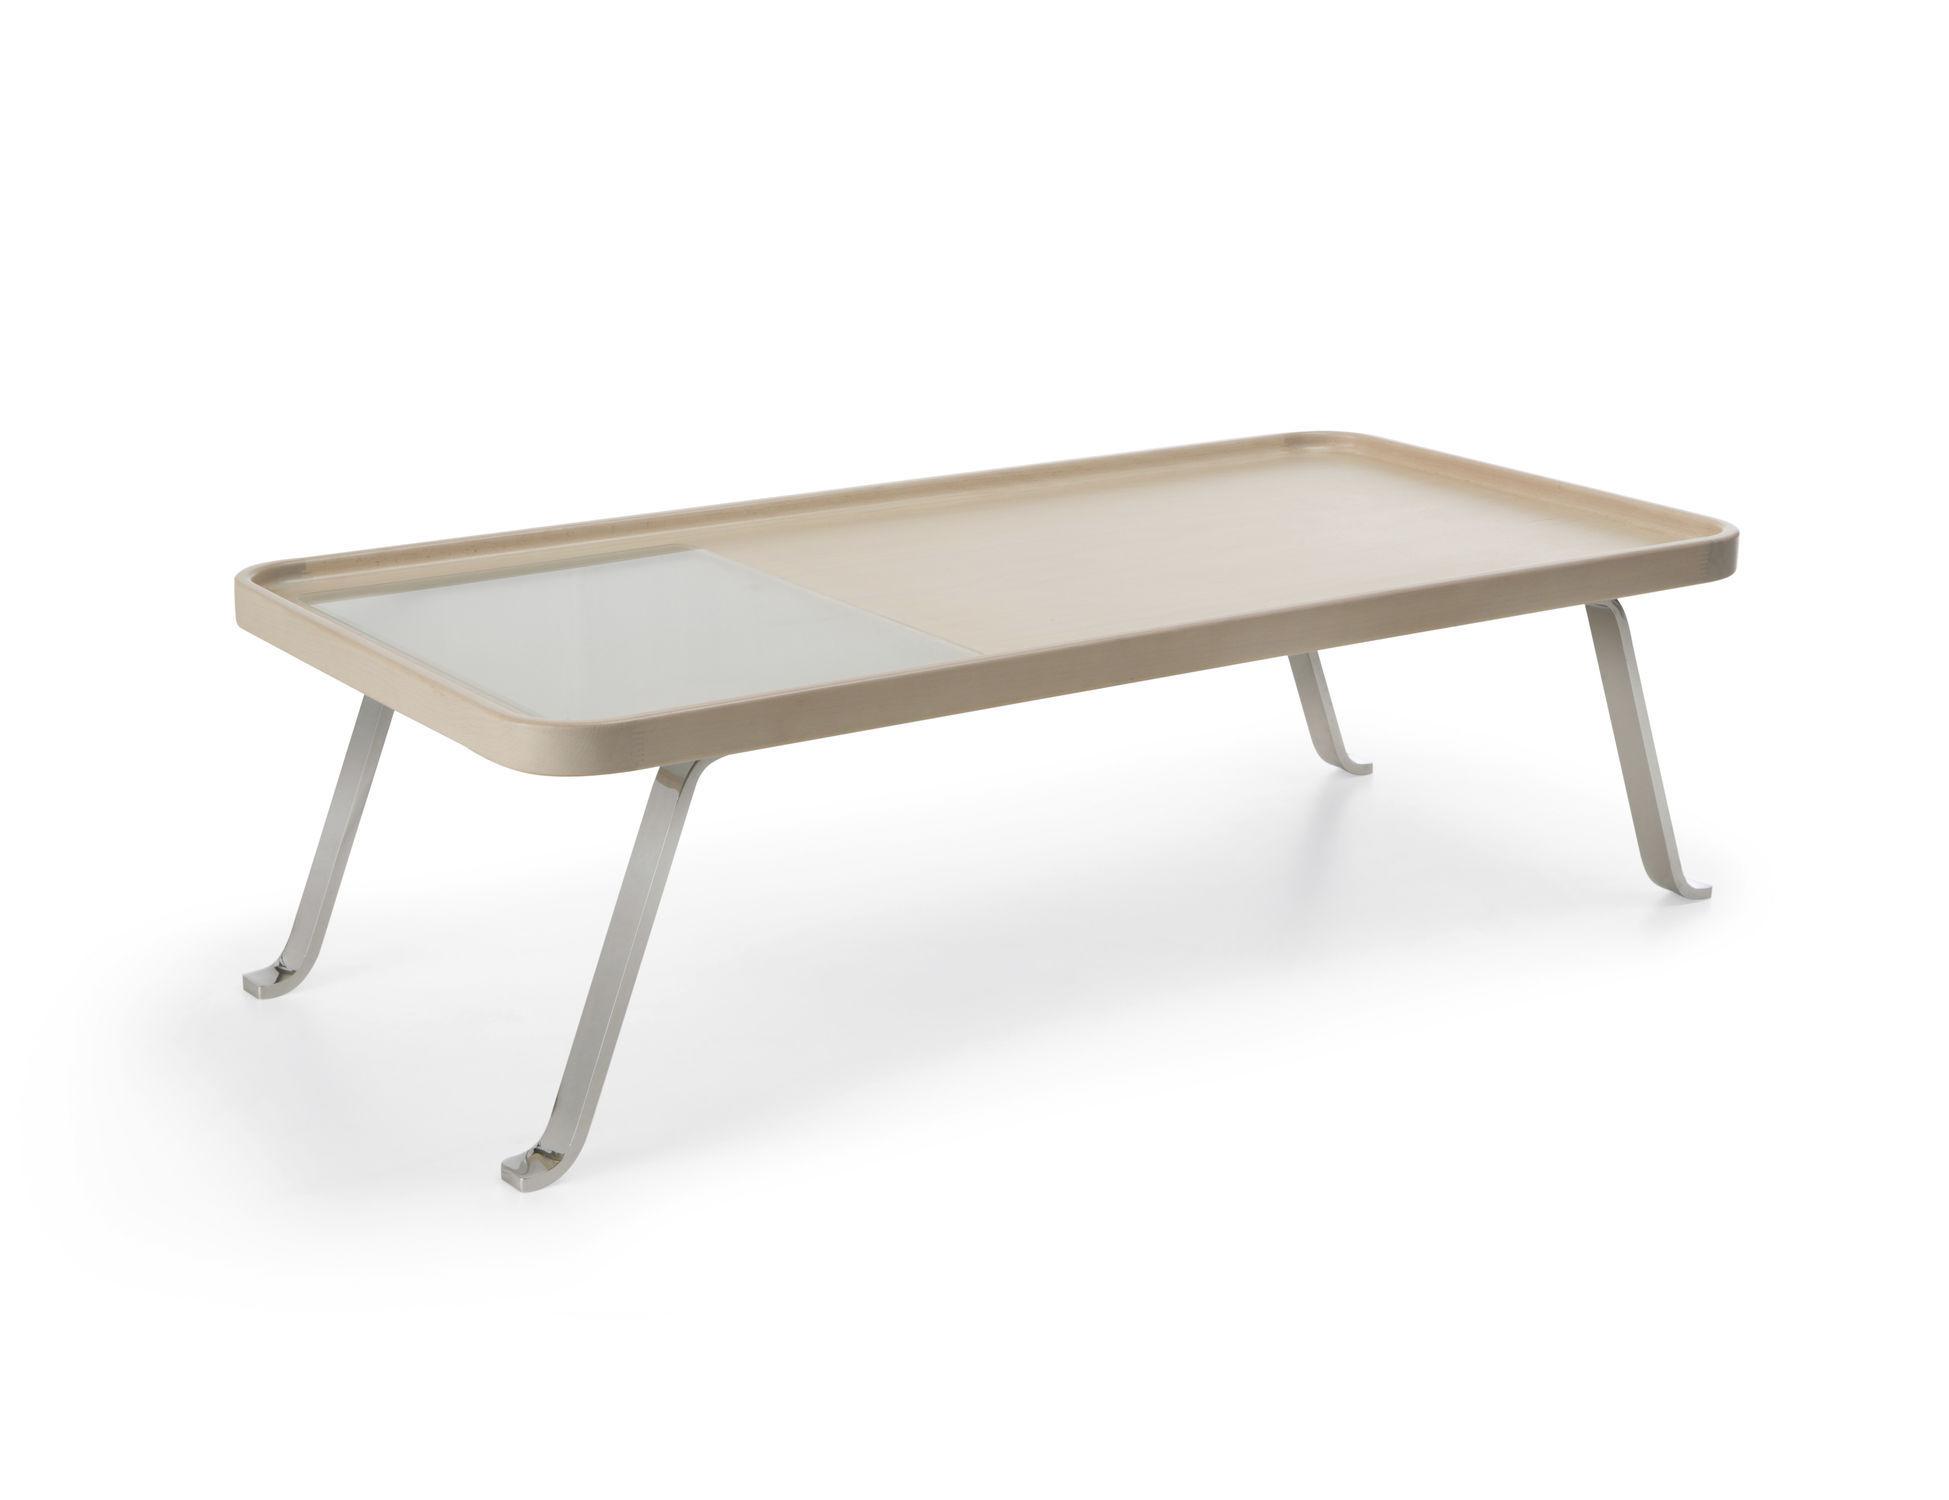 Contemporary coffee table wooden metal rectangular OCTOBER